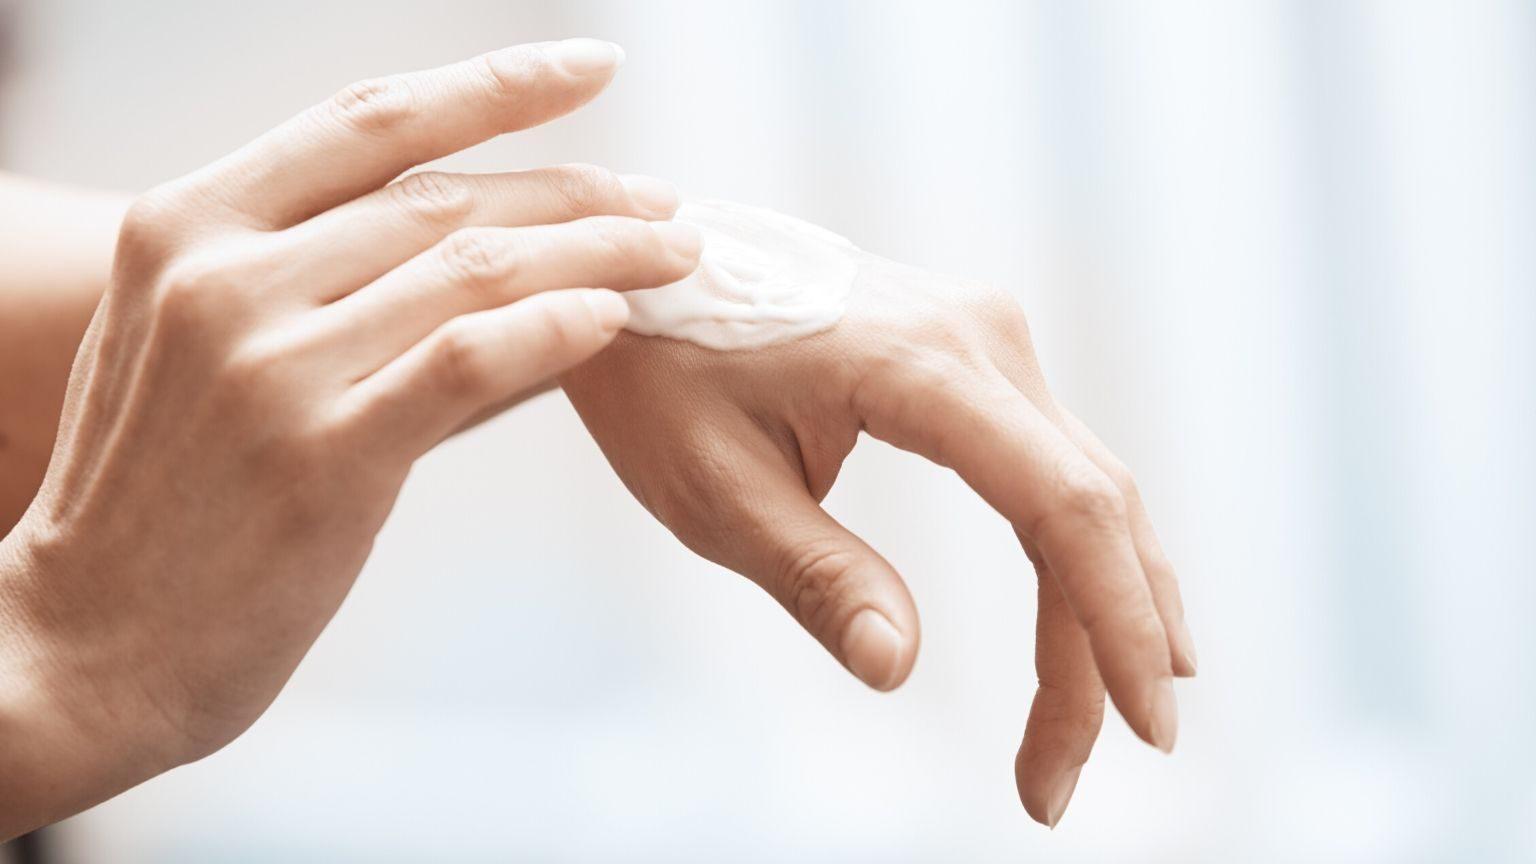 Woman using moisturizer on hands